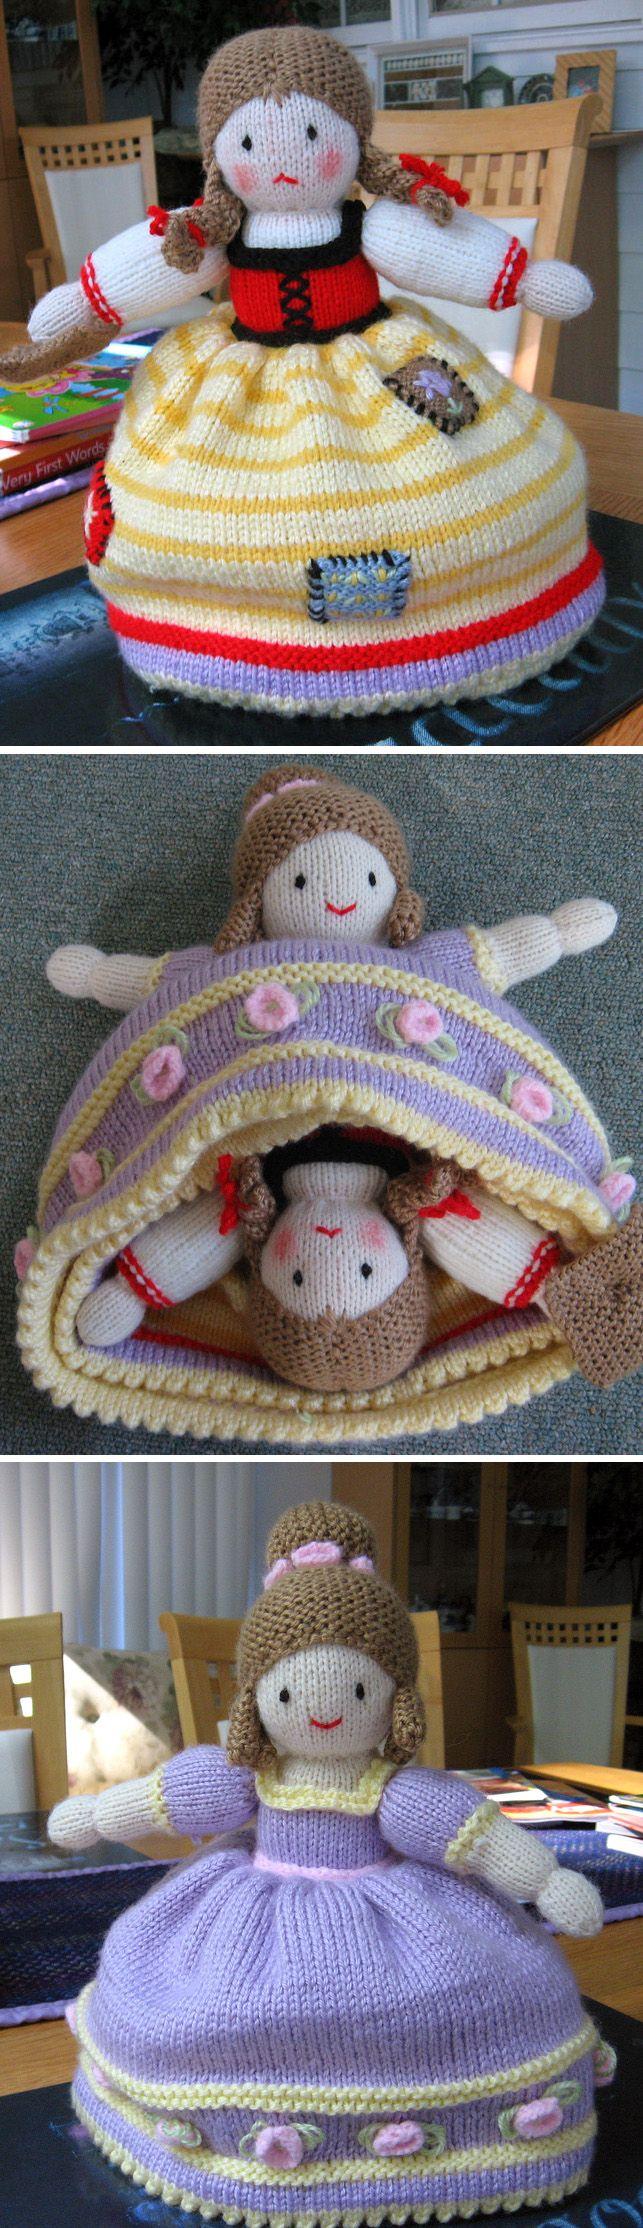 Knitting Pattern para Cinderella Topsy Turvy Doll - Cinderela pode ser transformada ...